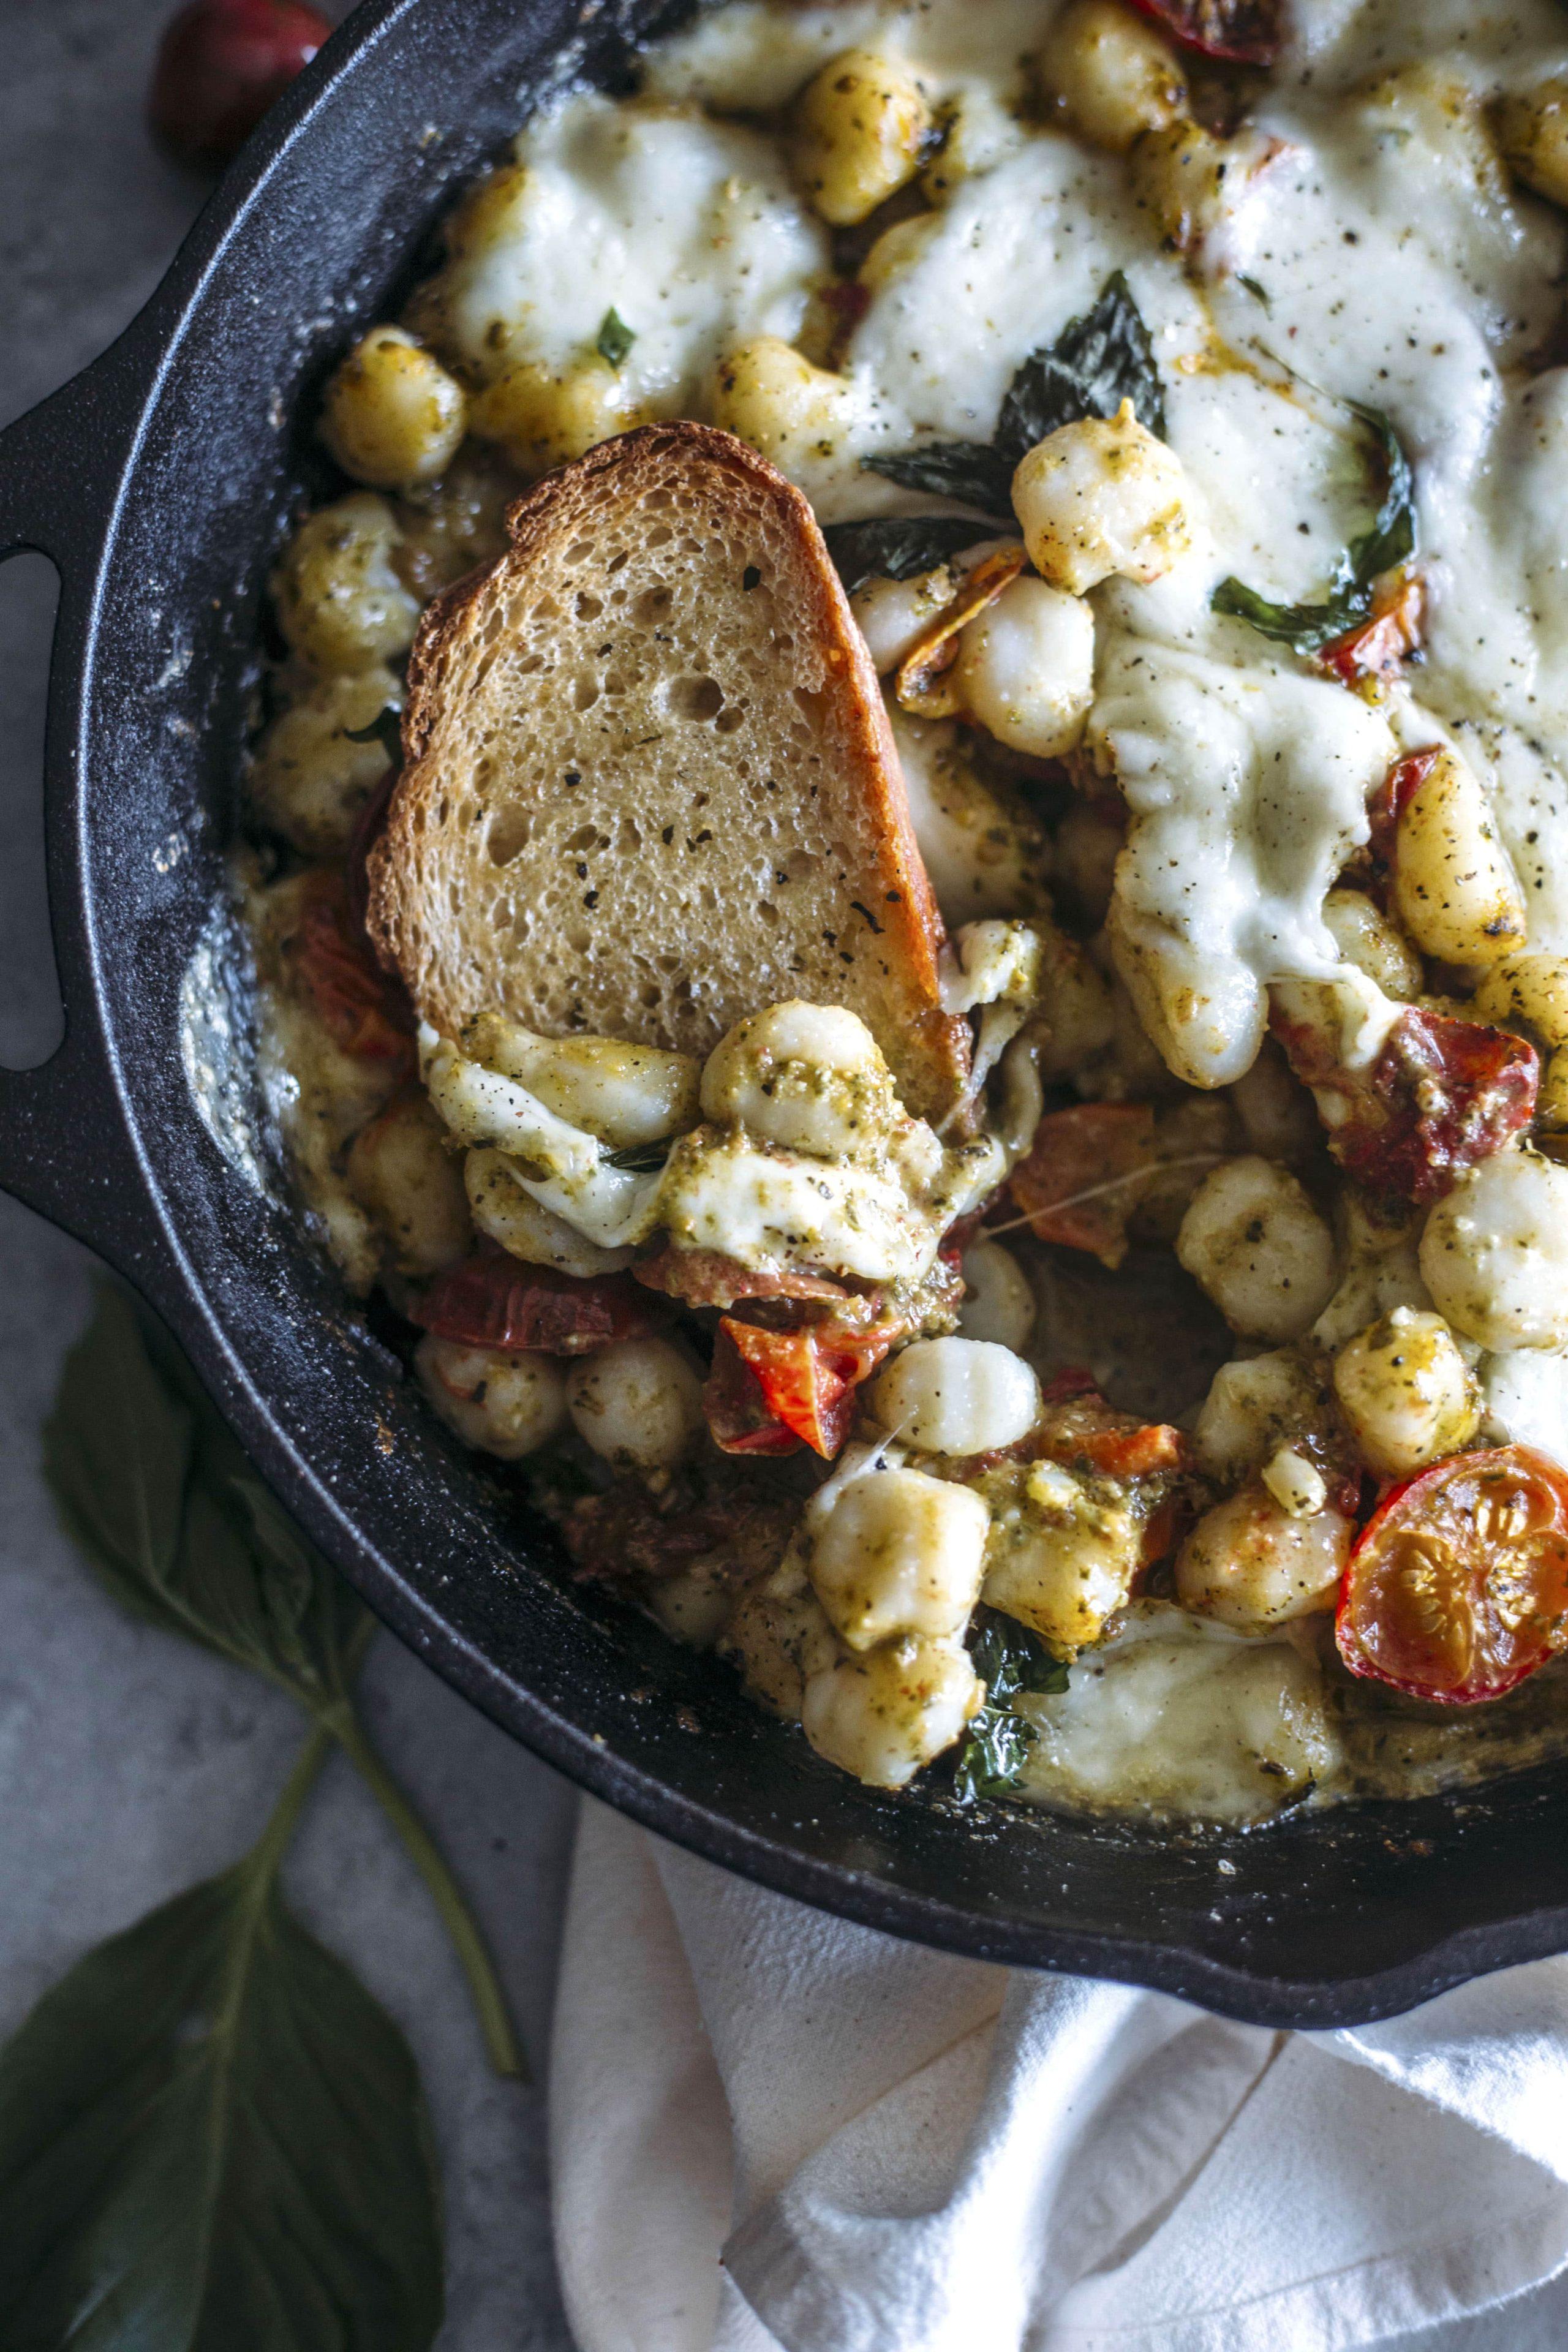 Gnocchi Filled Caprese Dip | Caprese flavors mix with pesto-marinated gnocchi in this delicious shareable dip!